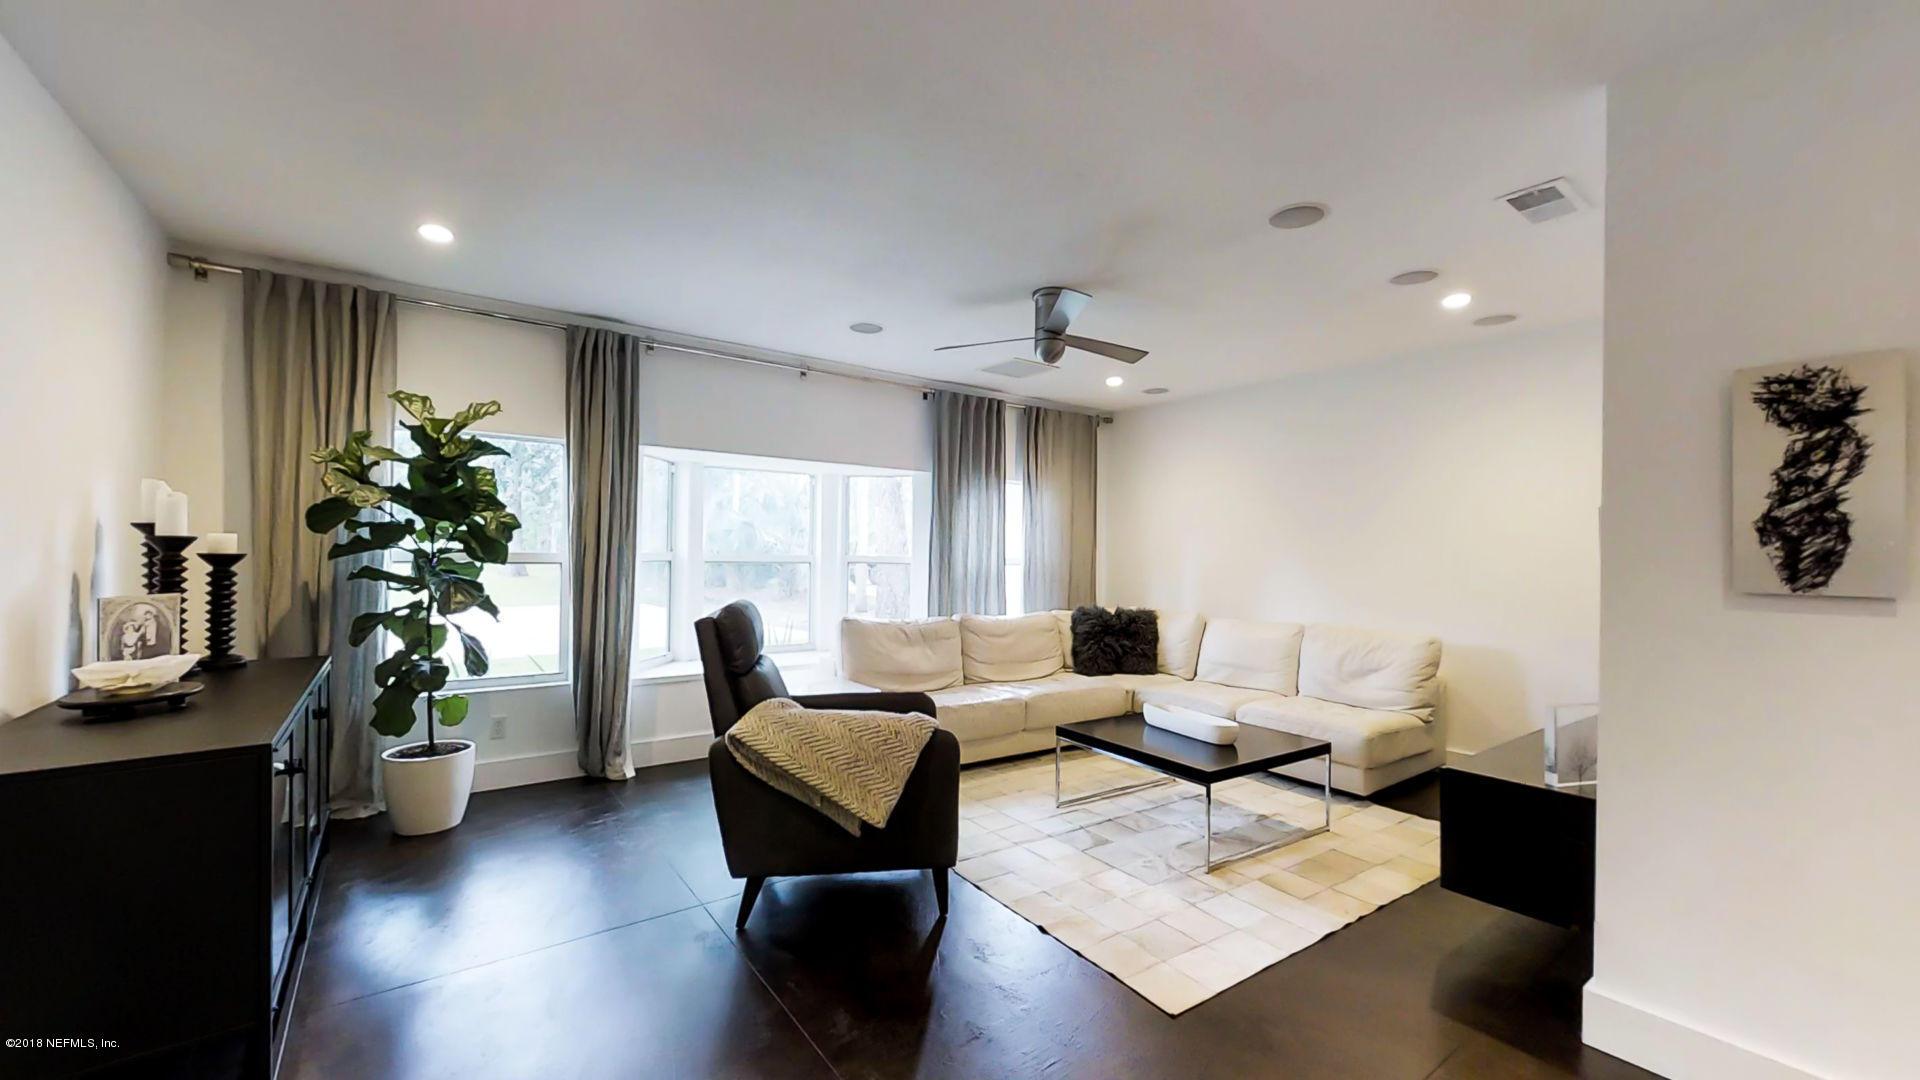 195 ROSCOE, PONTE VEDRA BEACH, FLORIDA 32082, 3 Bedrooms Bedrooms, ,2 BathroomsBathrooms,Residential - single family,For sale,ROSCOE,953081